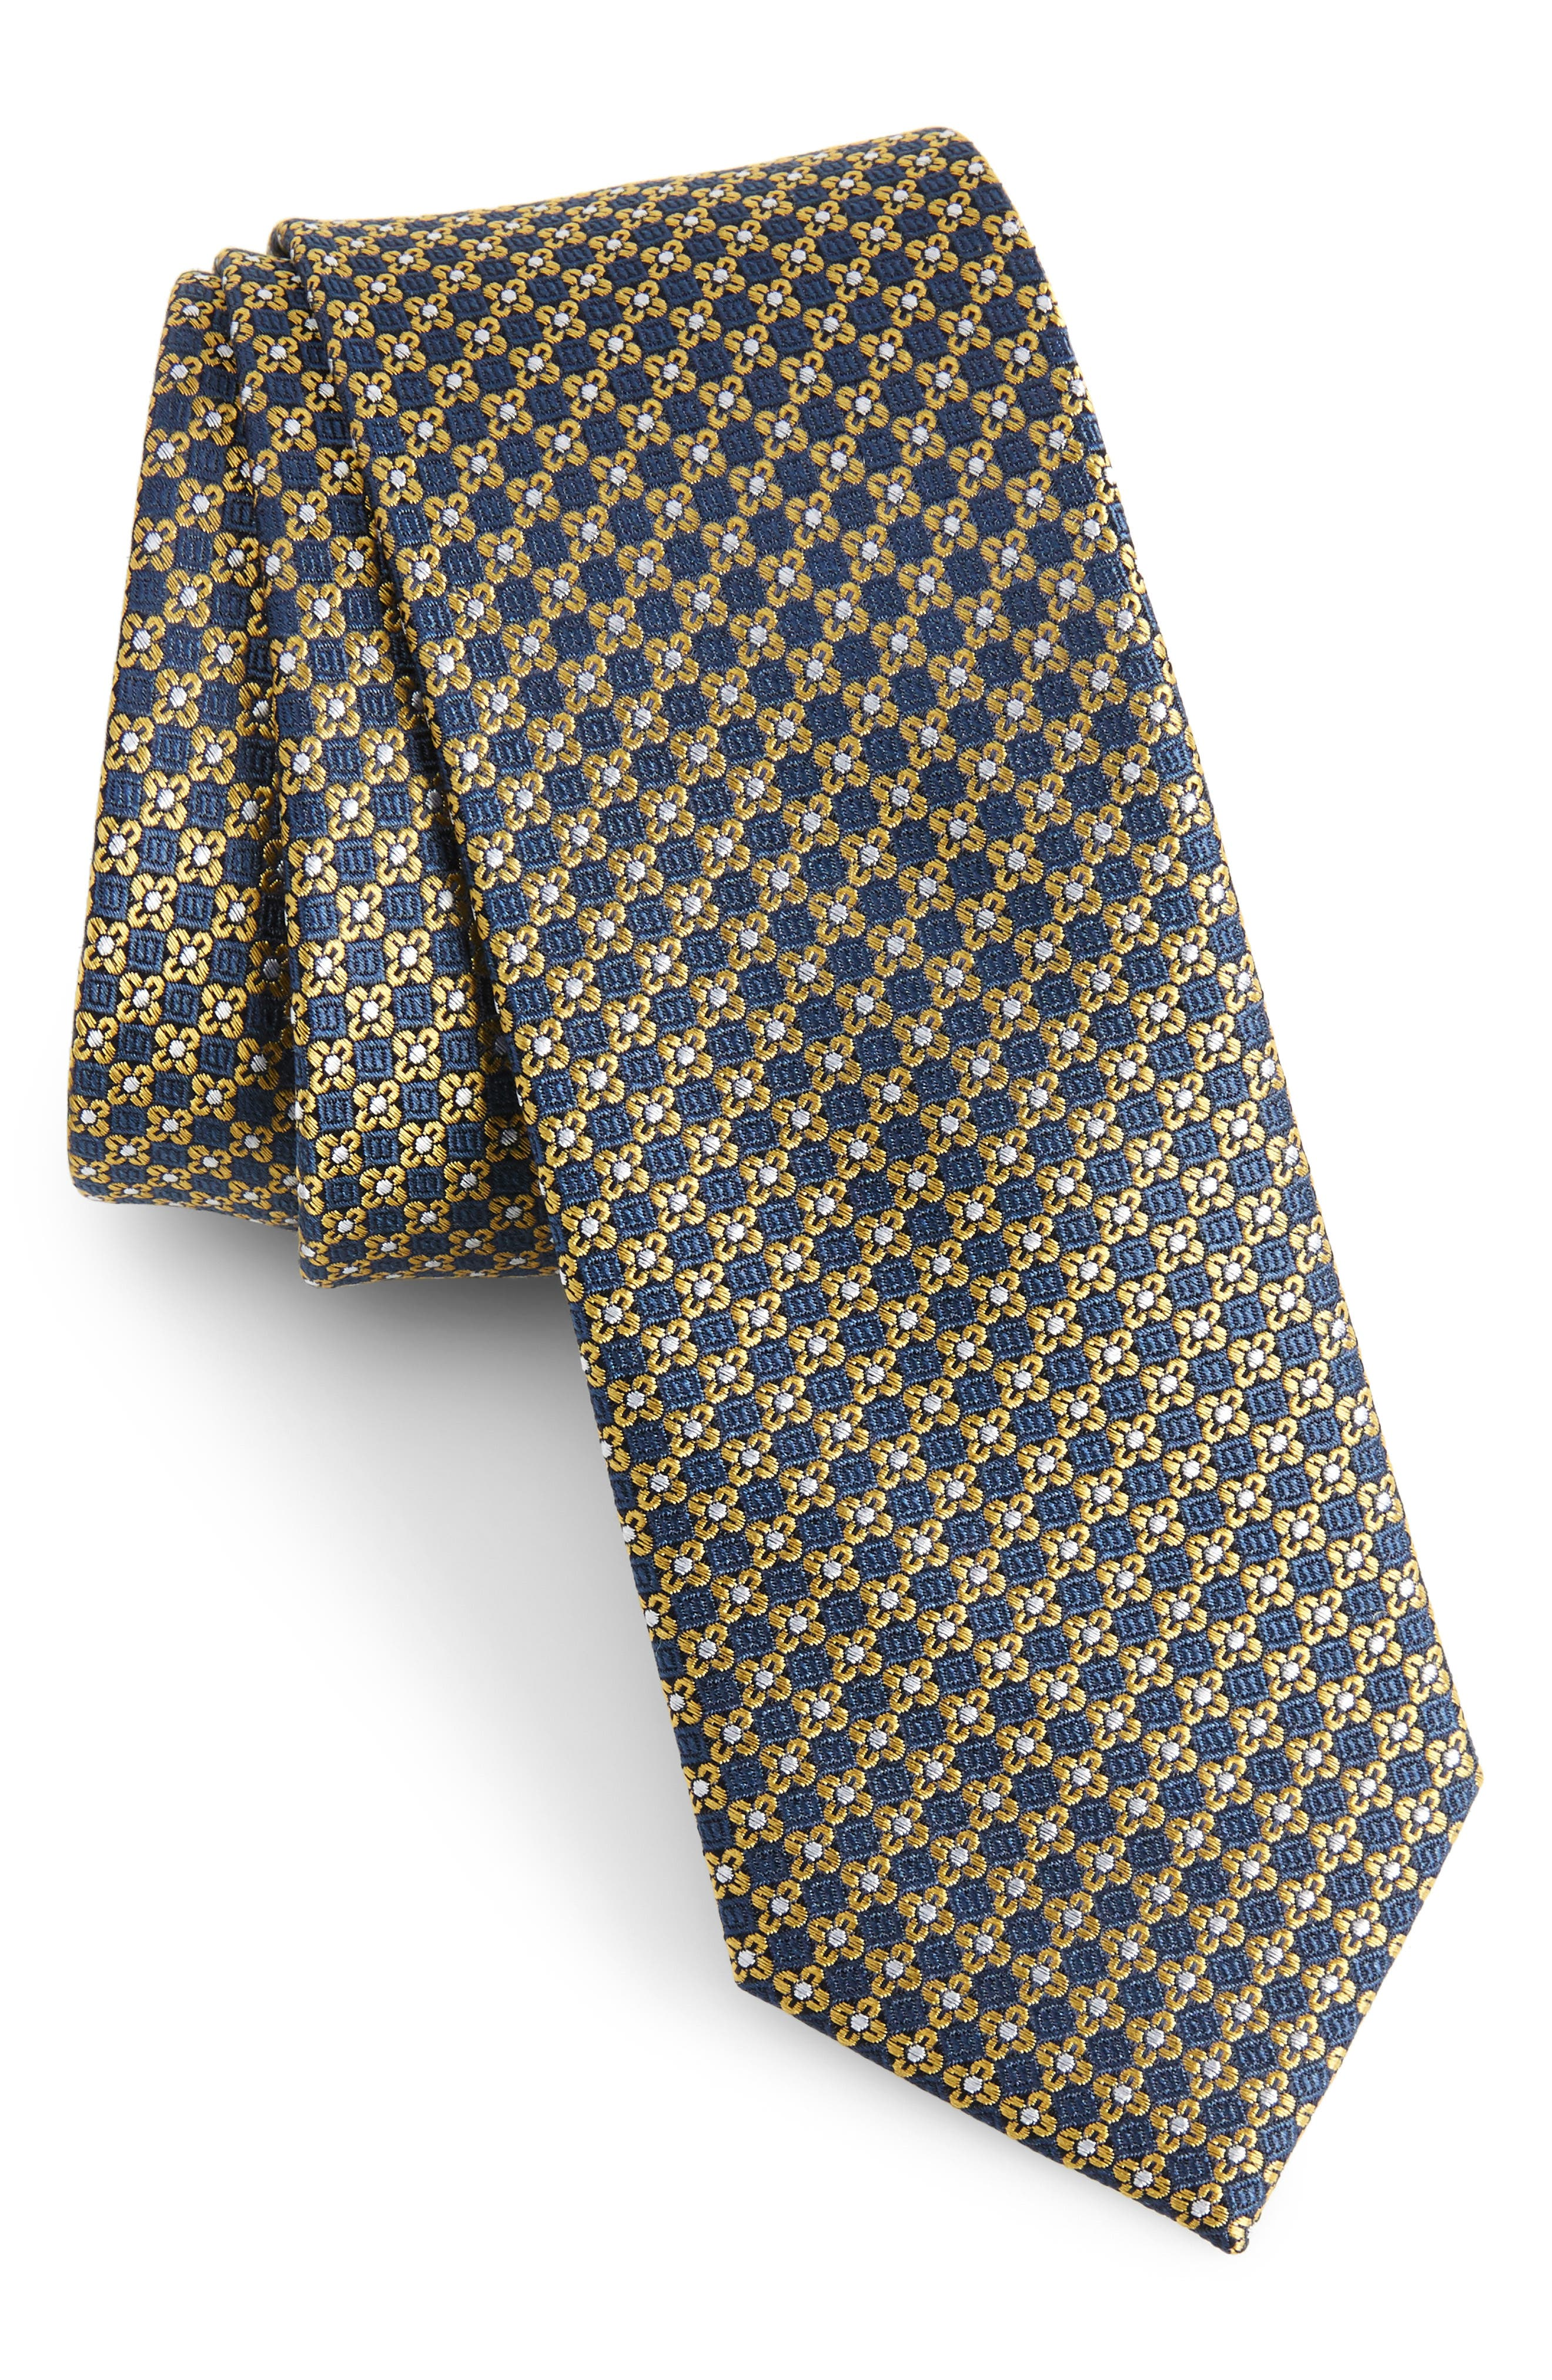 The Tie Bar Floral Network Silk Skinny Tie